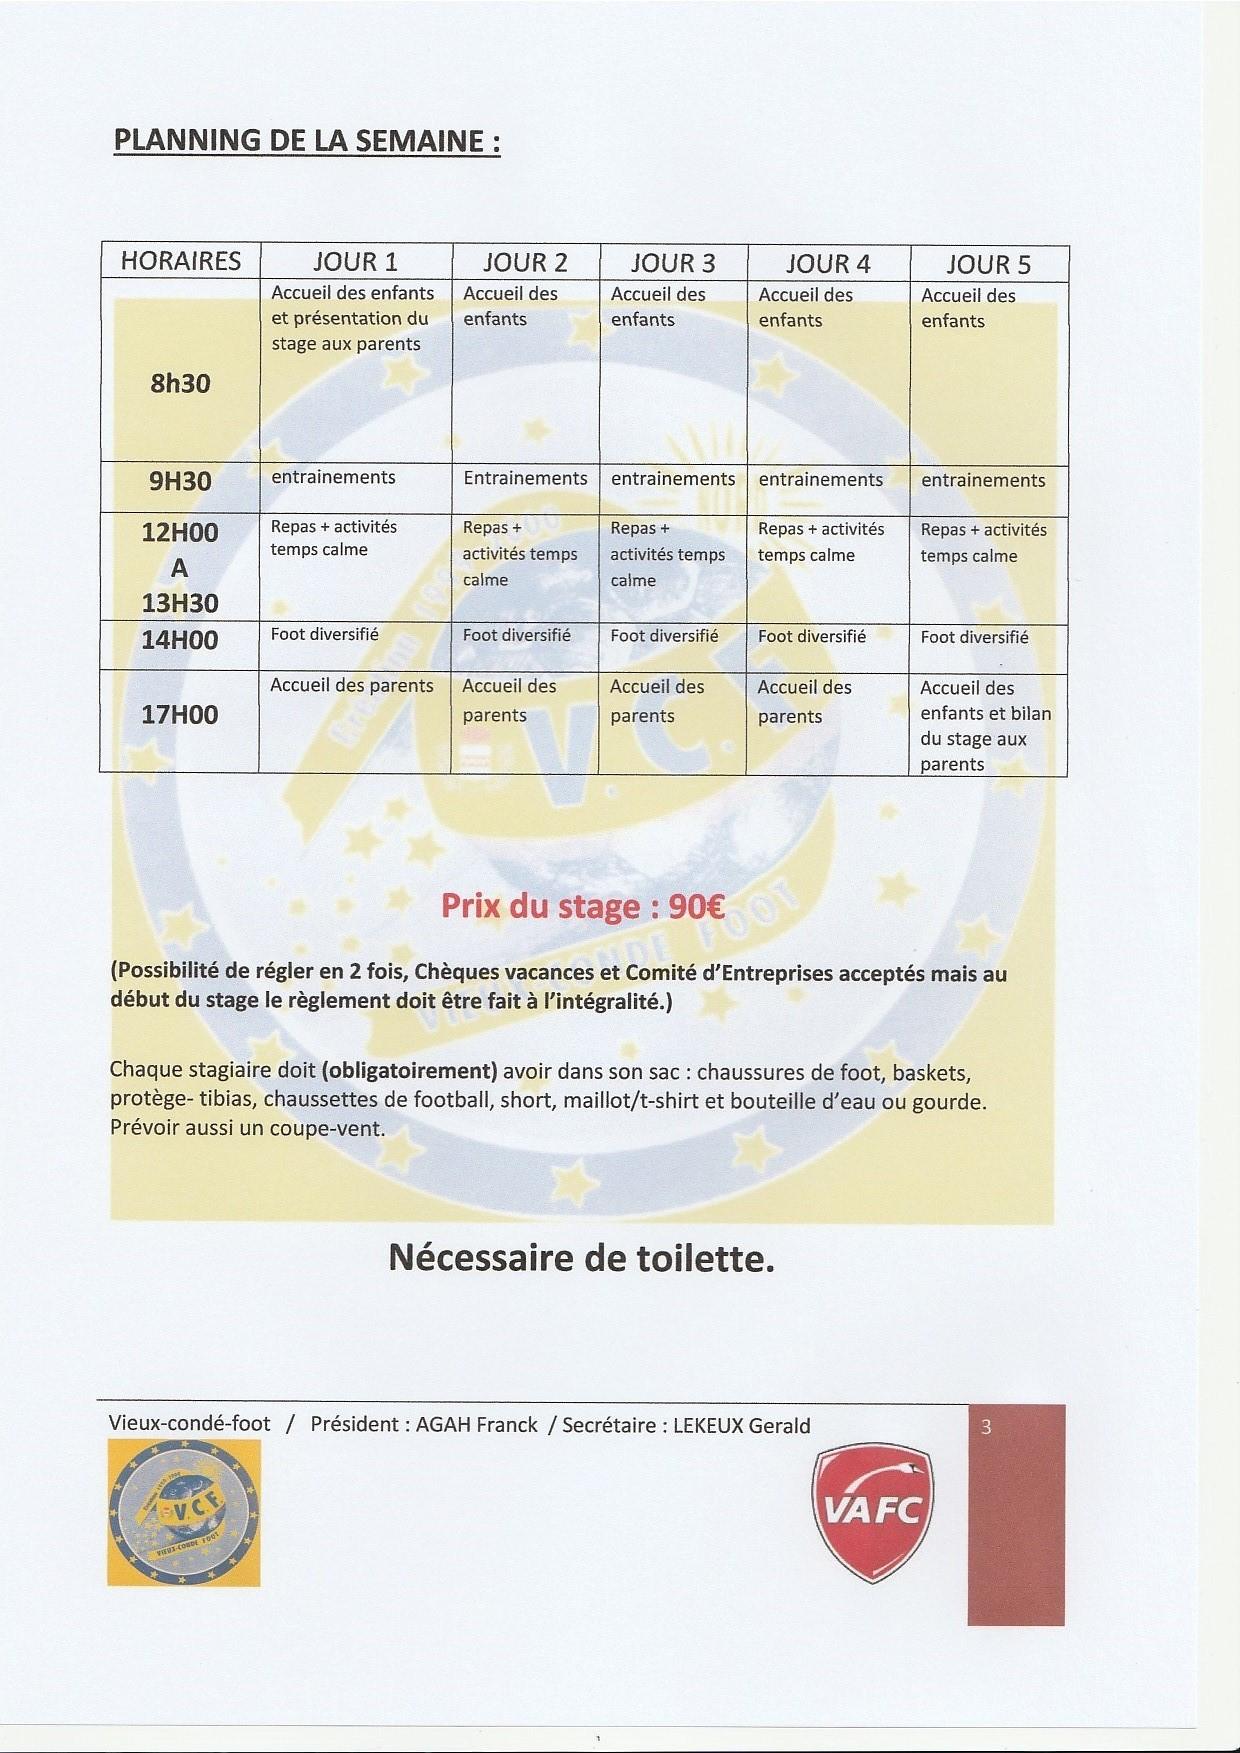 dossier page 3.jpg